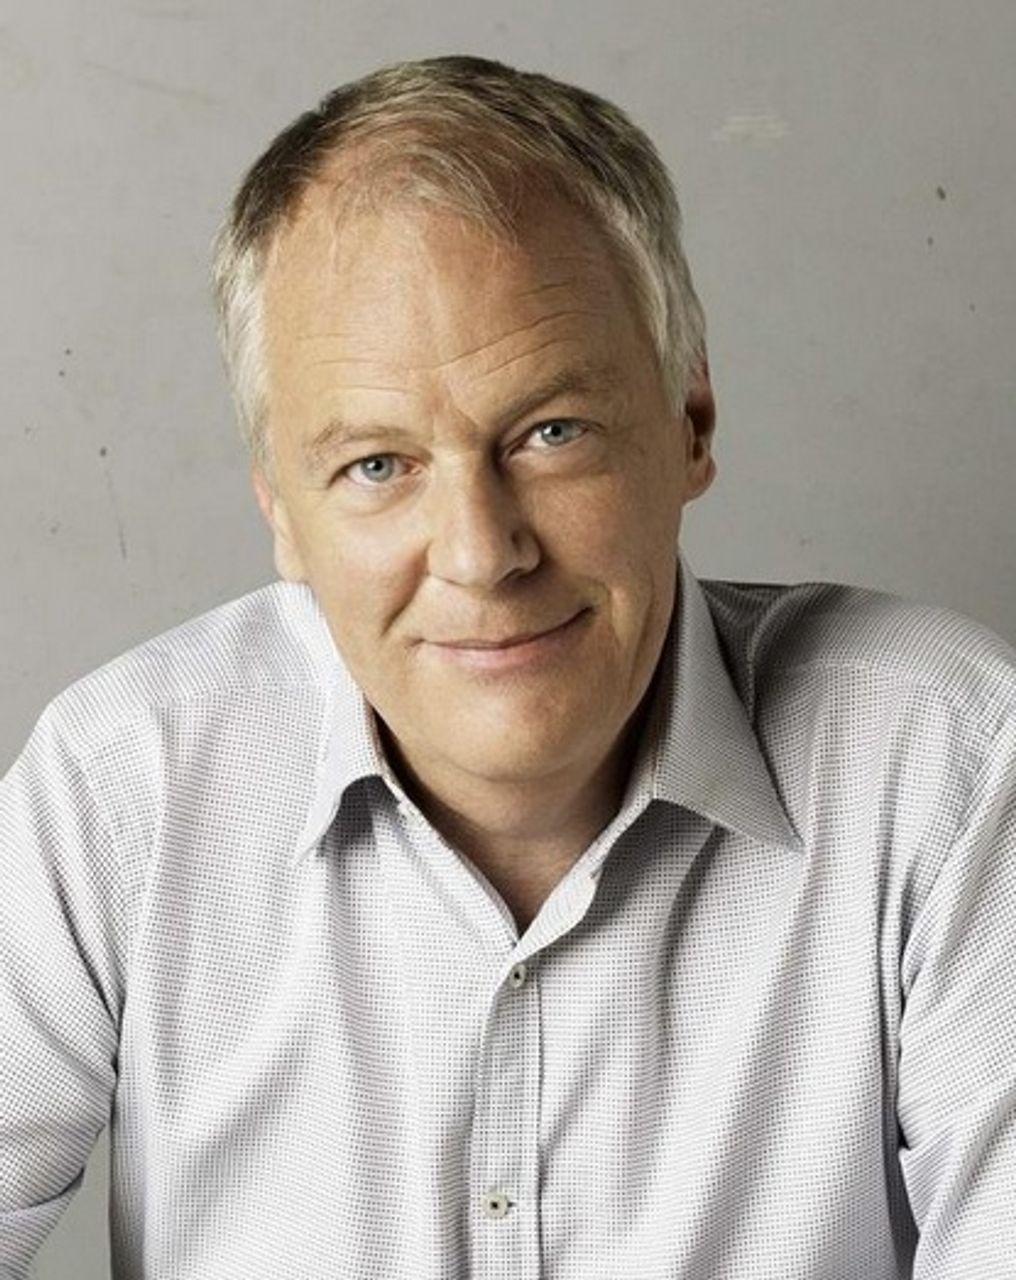 Australian investigative journalist exposes Guardian/New York Times betrayal of Assange